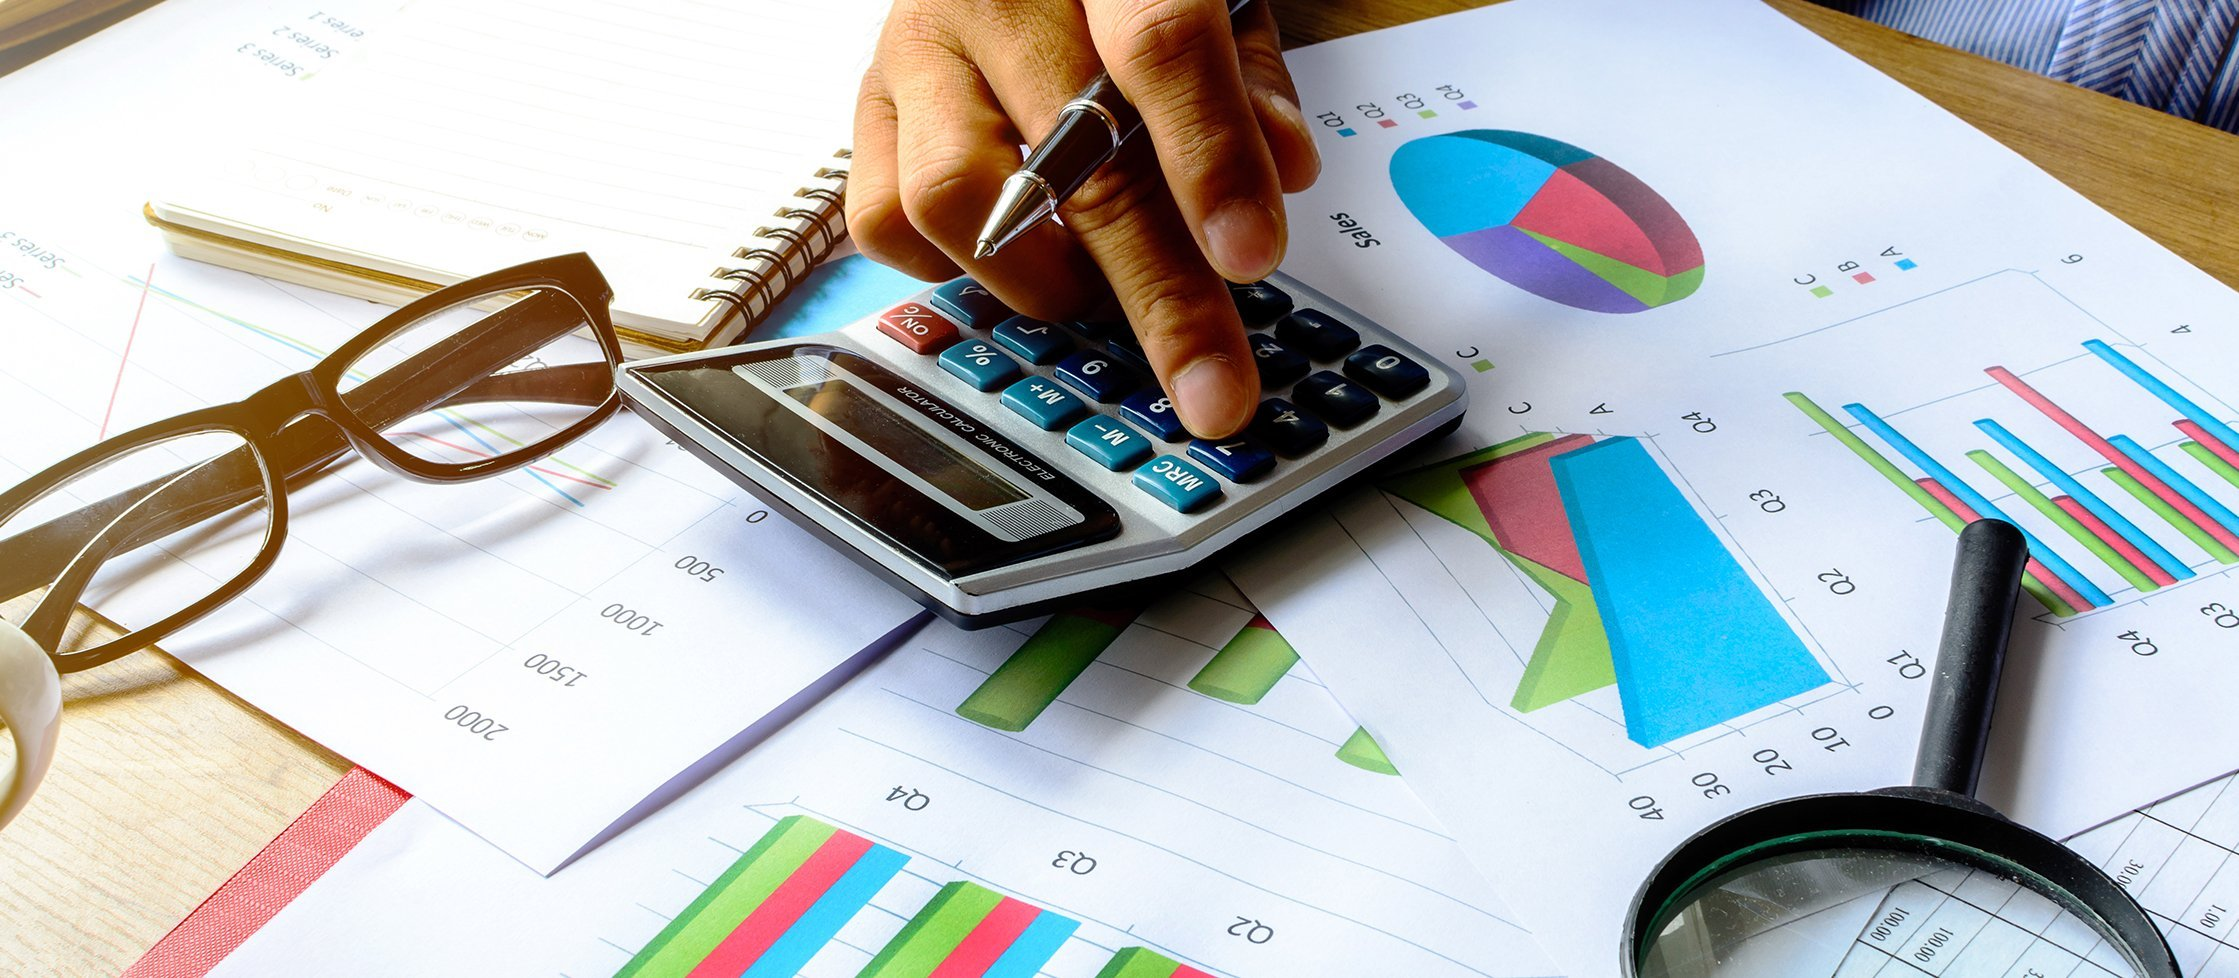 Finances and calculator | iTMunch